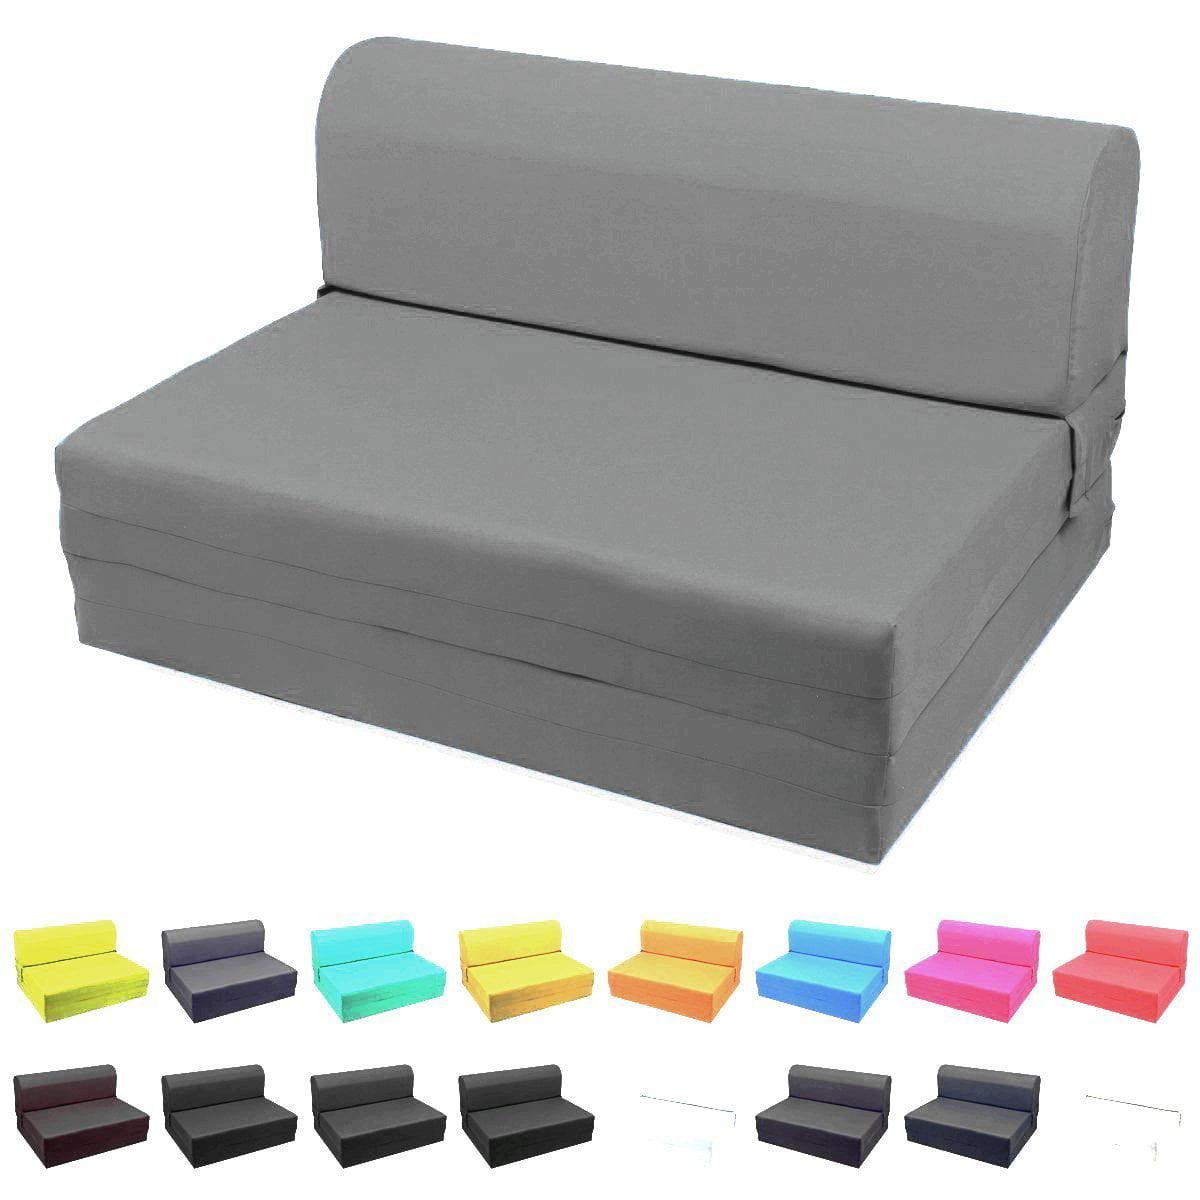 MaGshion Sleeper Chair Folding Foam Bed Sized Single Size 5x23x70 Inch Dark Gray